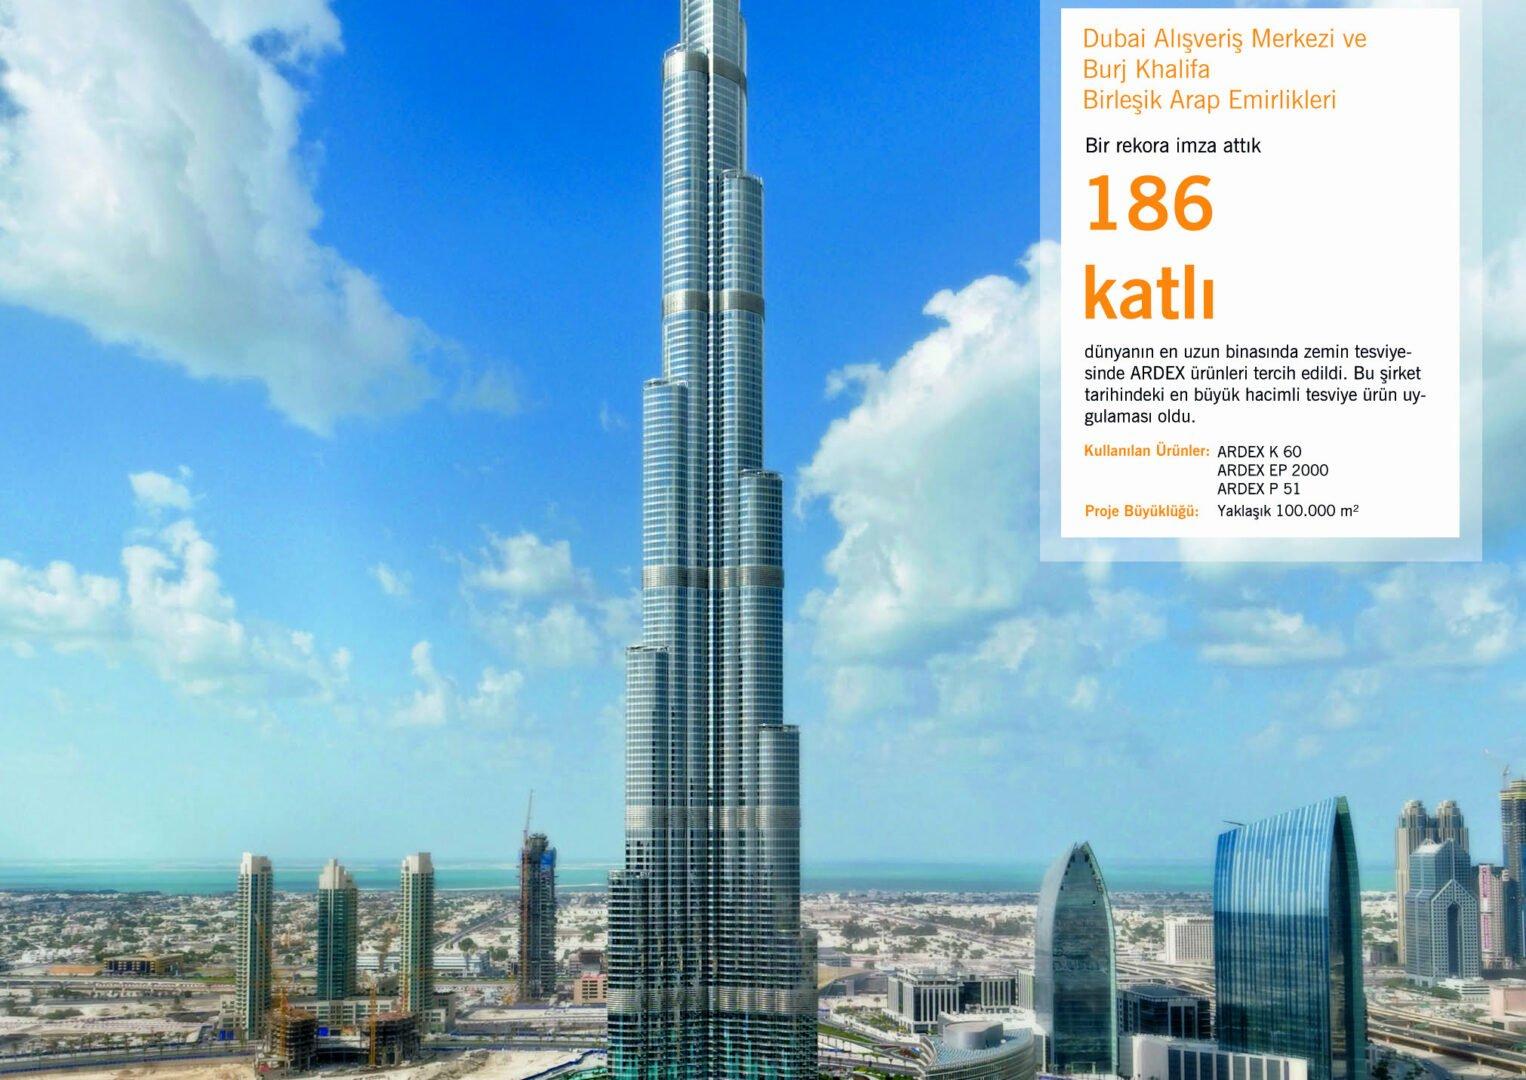 Dubai Mall & Burj Khalifa 1